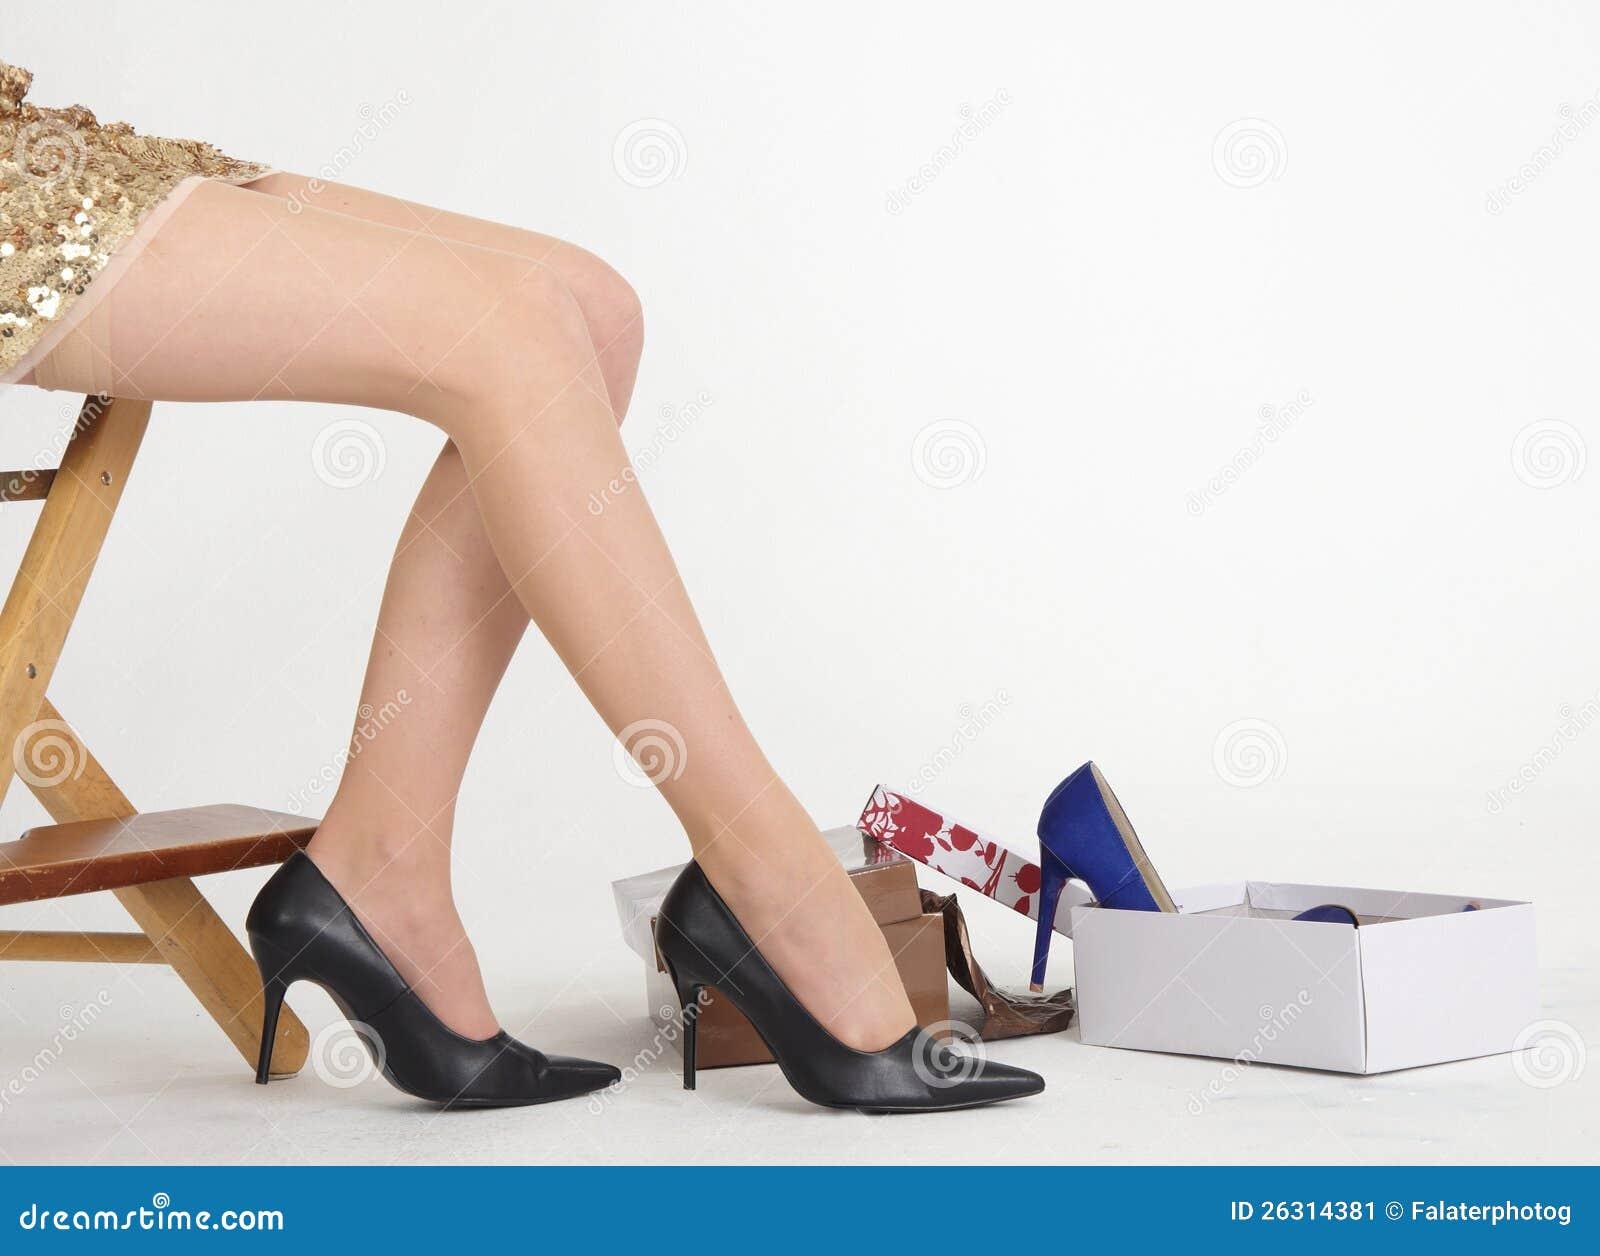 s legs shoe shopping in shoe store stock image